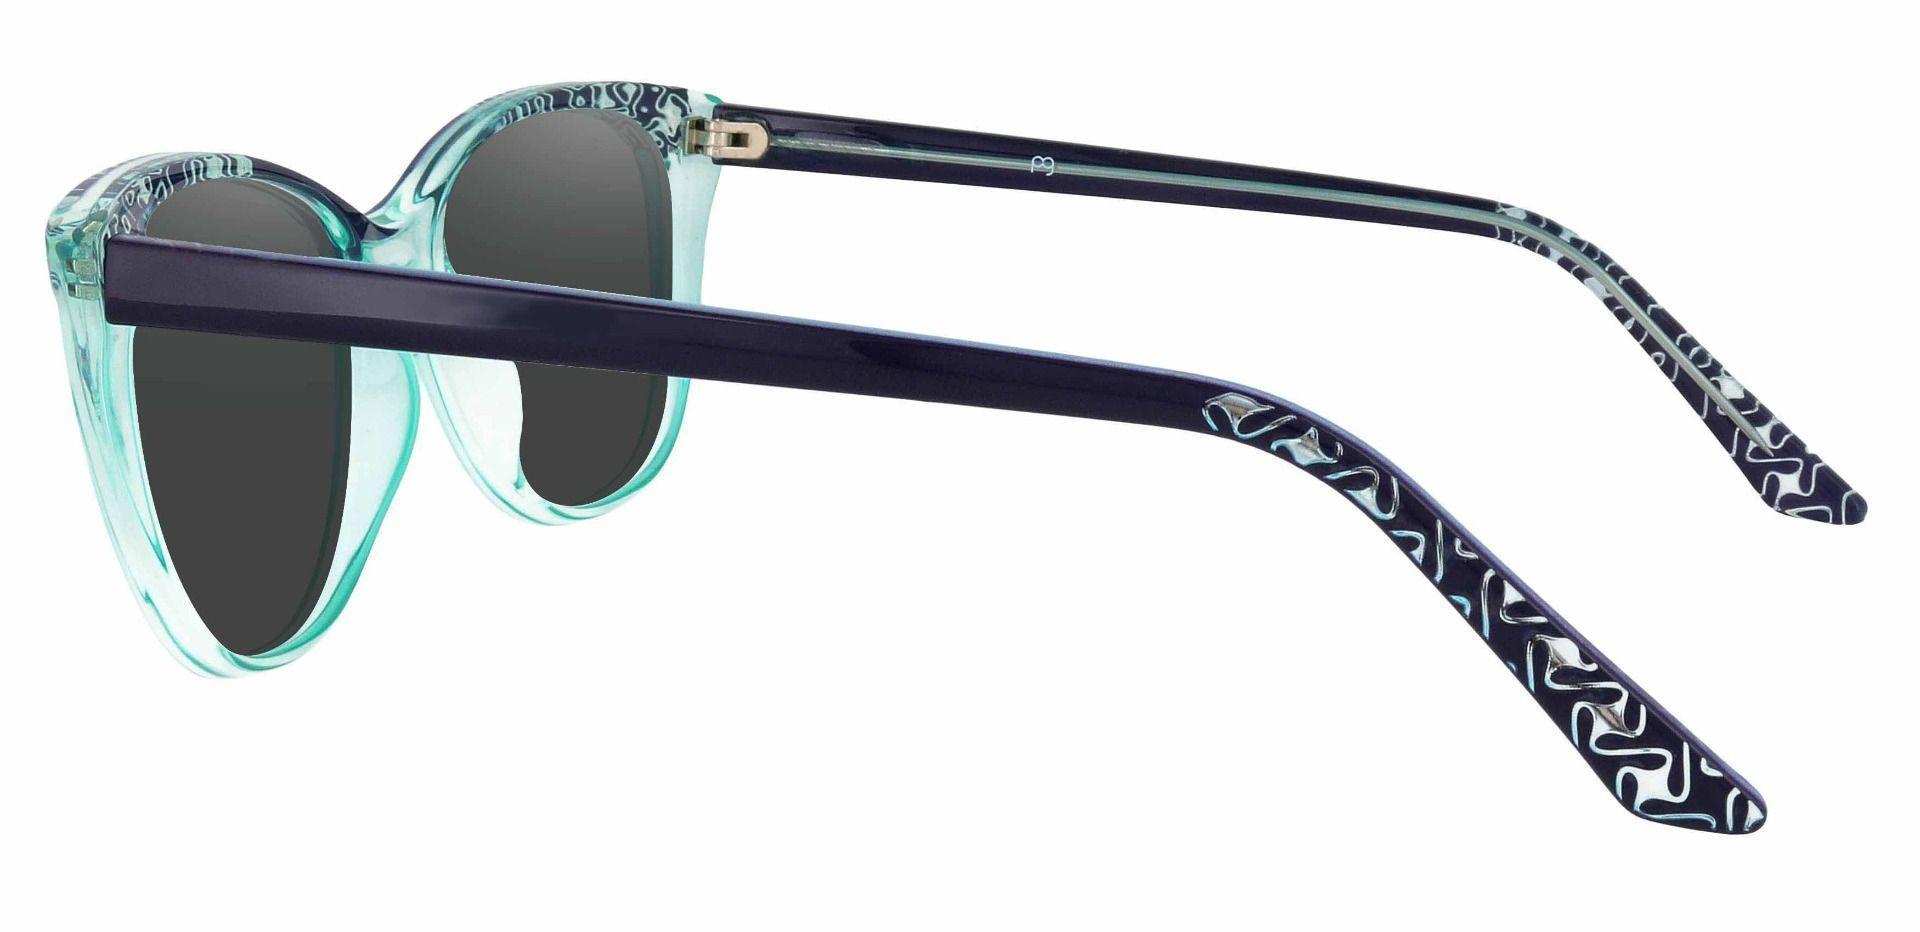 Alberta Cat Eye Lined Bifocal Sunglasses - Blue Frame With Gray Lenses